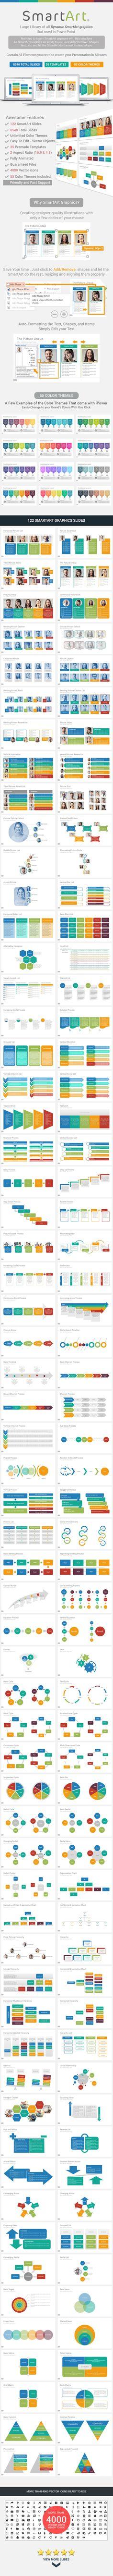 SmartArt Library PowerPoint Presentation Template #design #slides Download: http://graphicriver.net/item/smartart-library-powerpoint-presentation-template/13795473?ref=ksioks